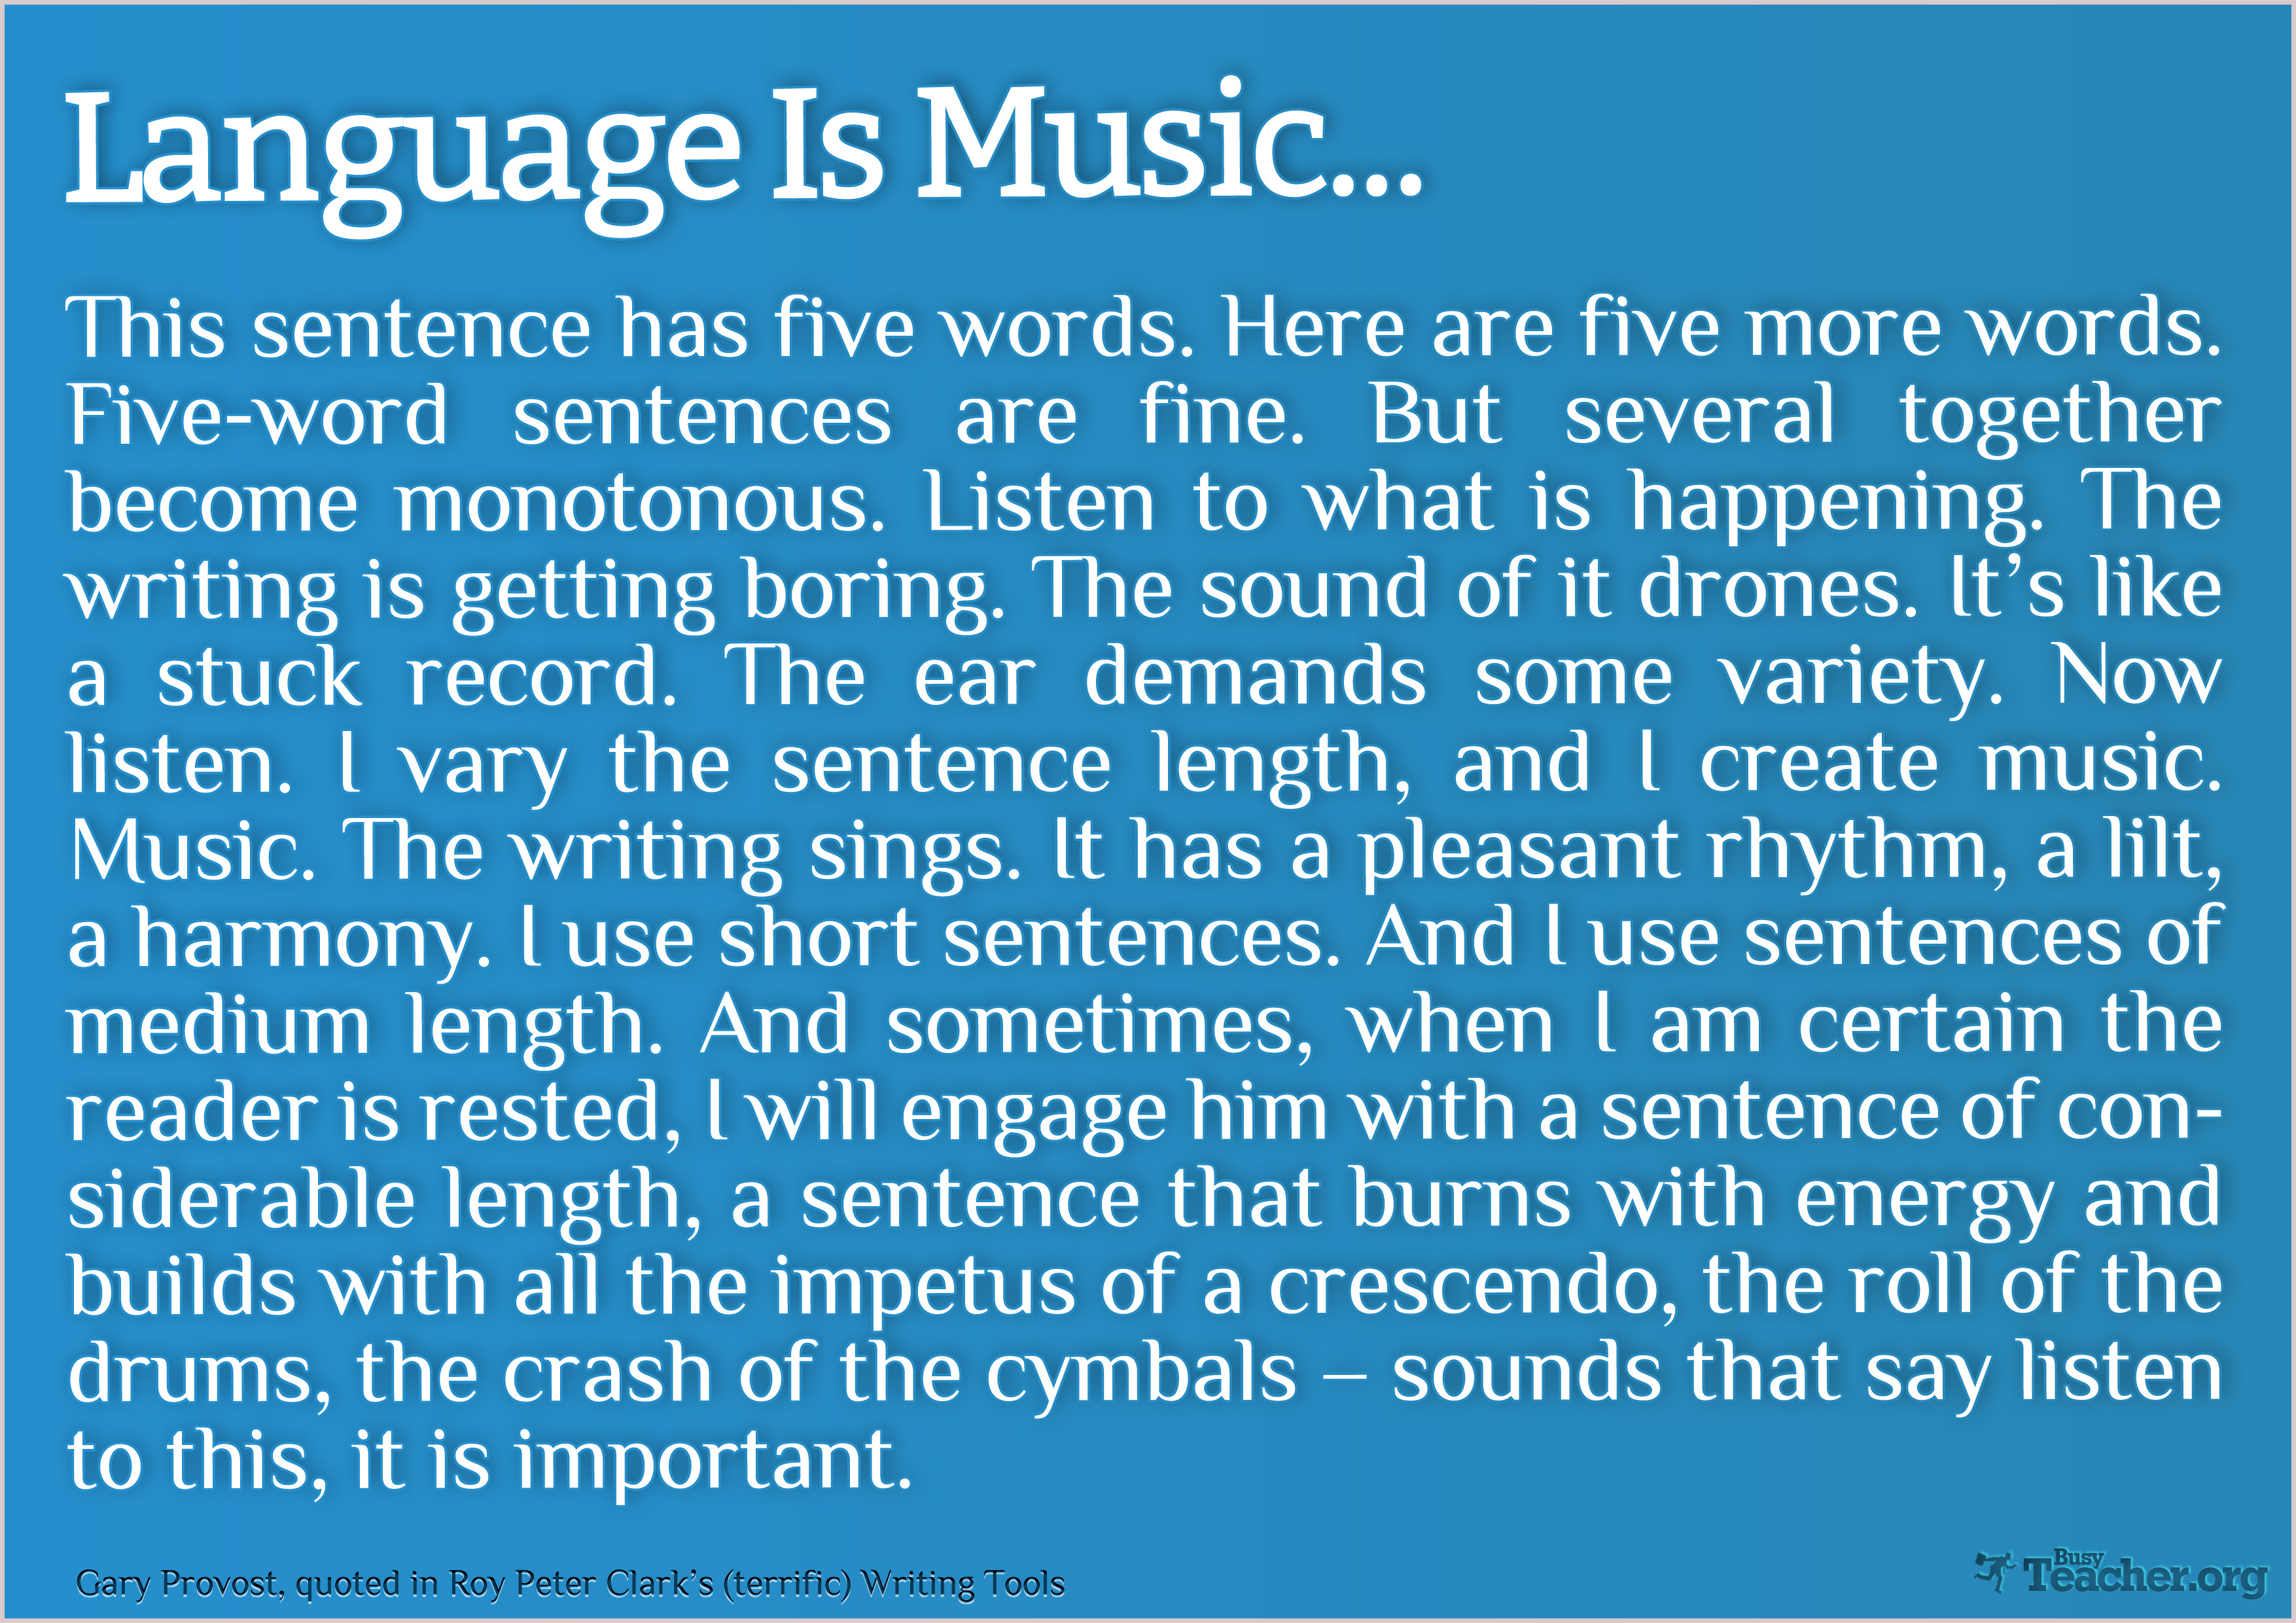 Language and music